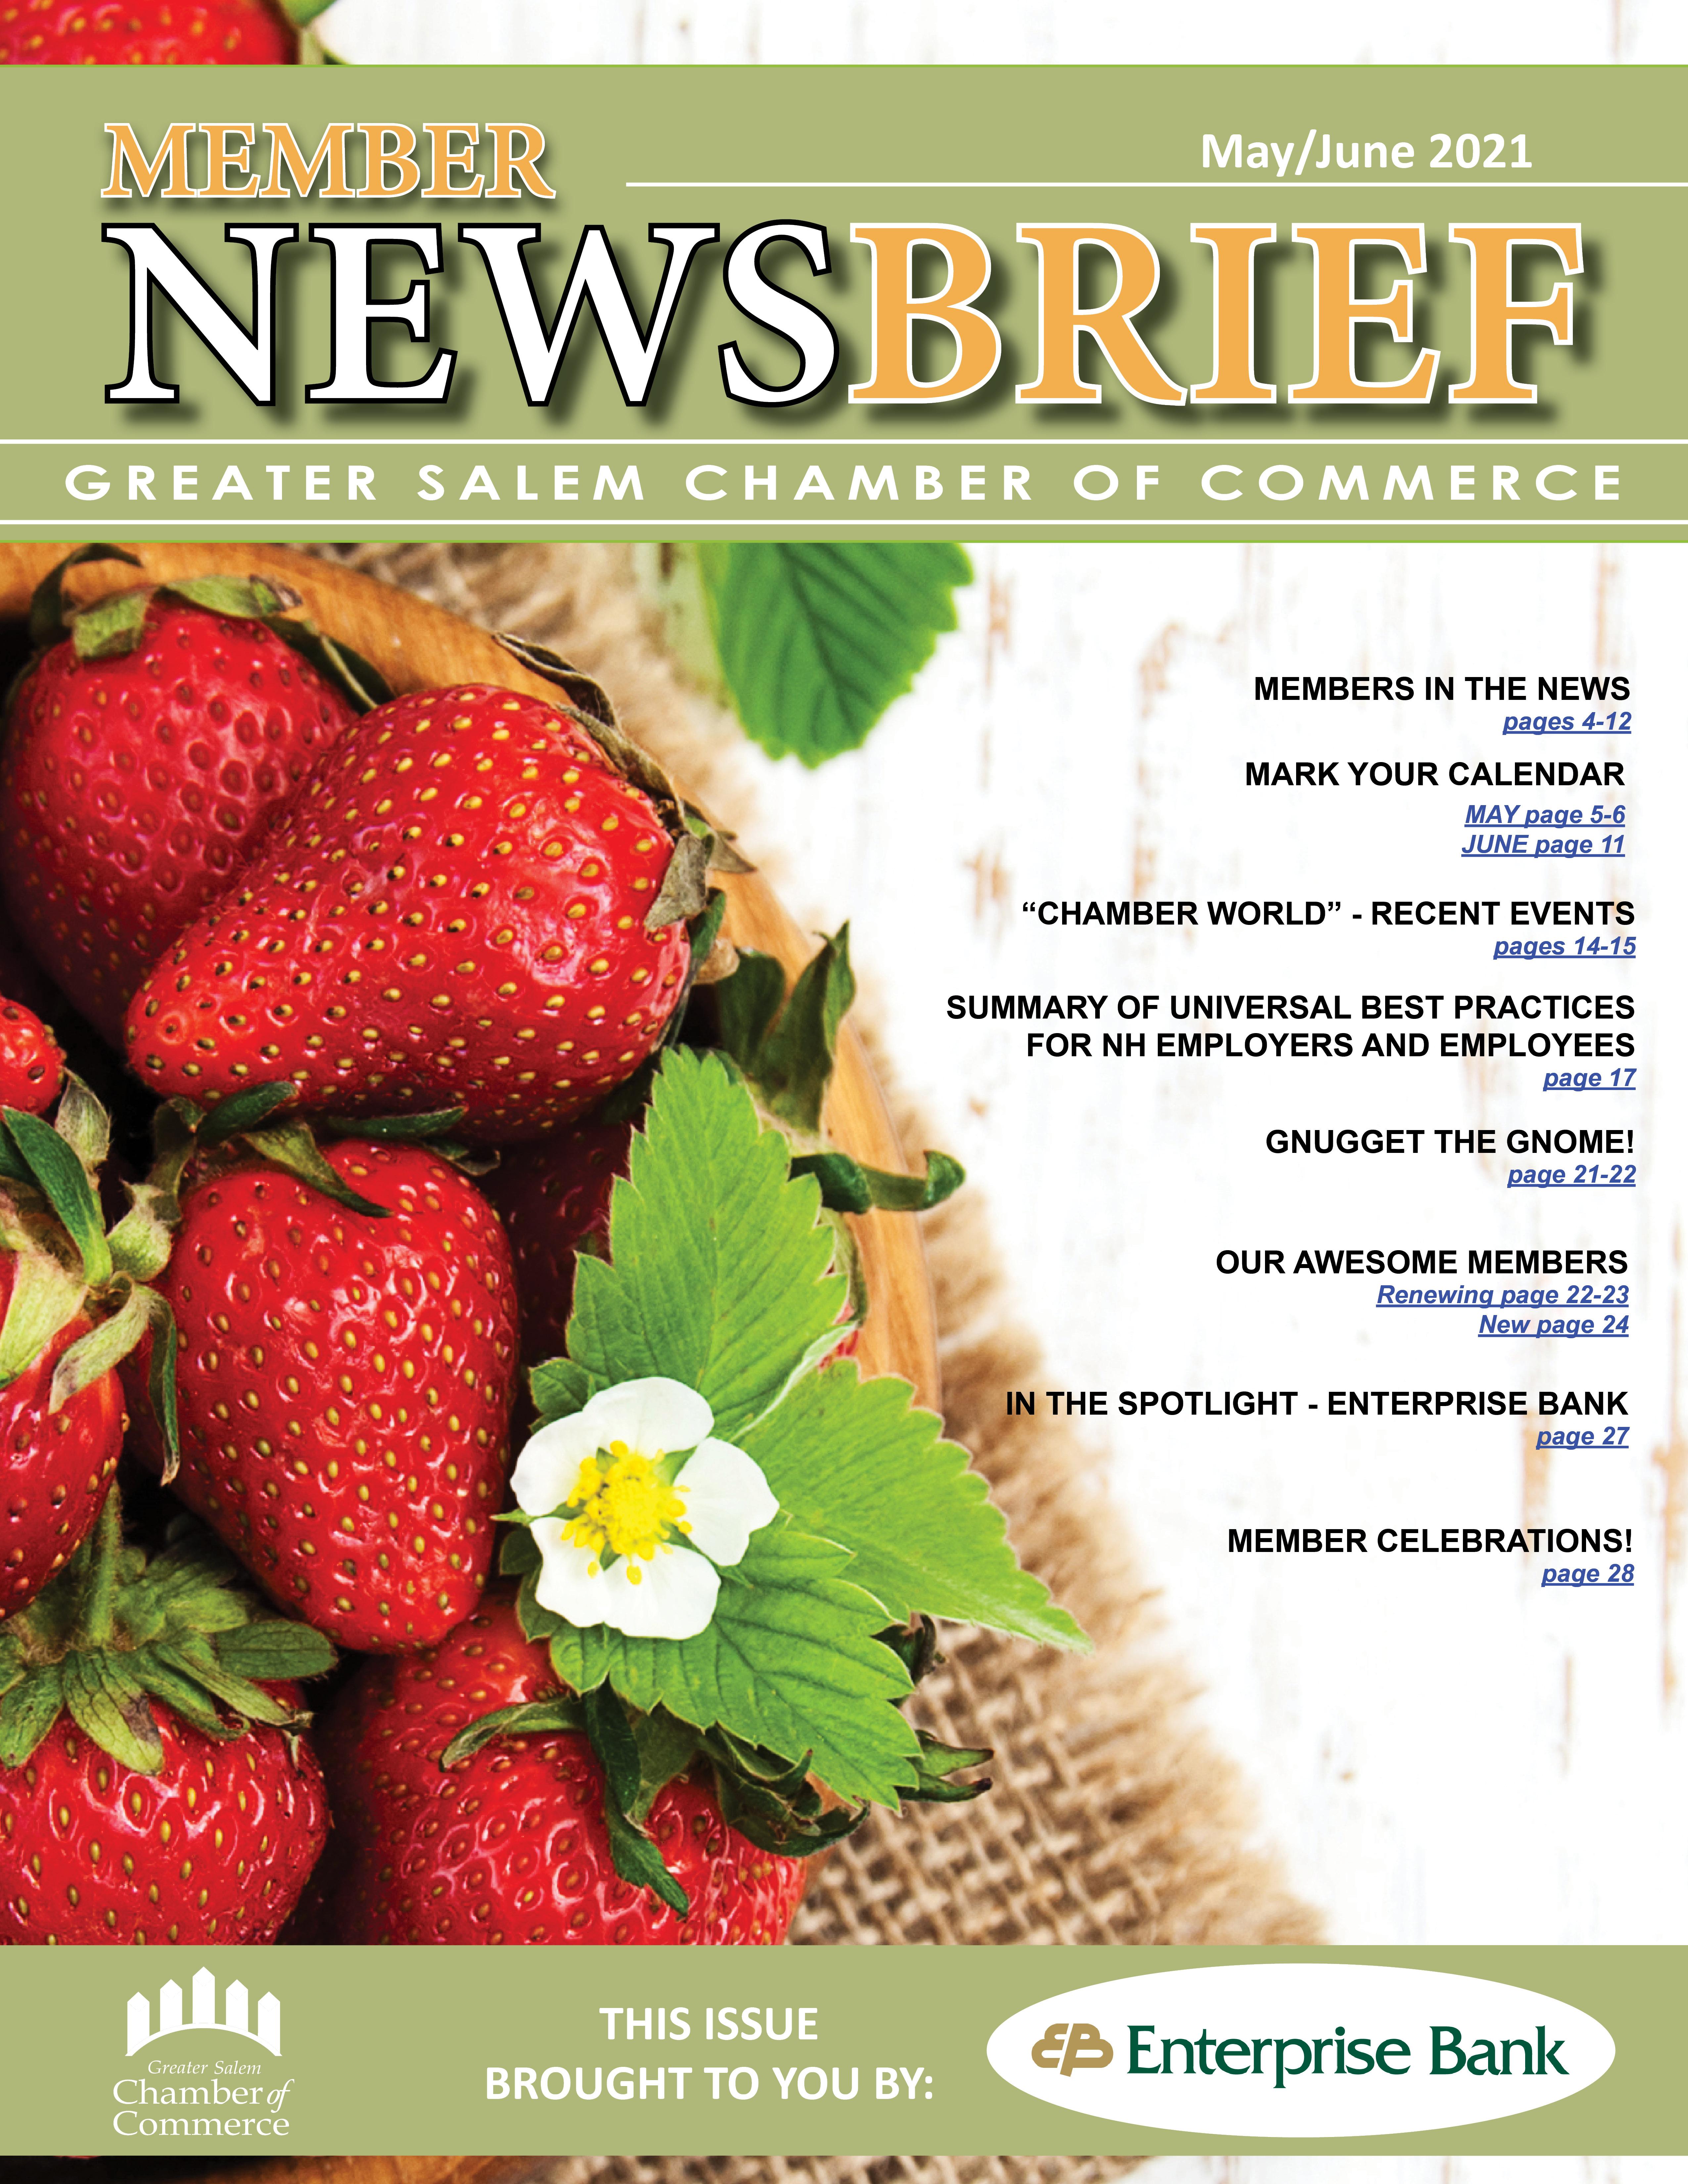 2021-NEWSBRIEF-MAY-JUNE-COVER.jpg